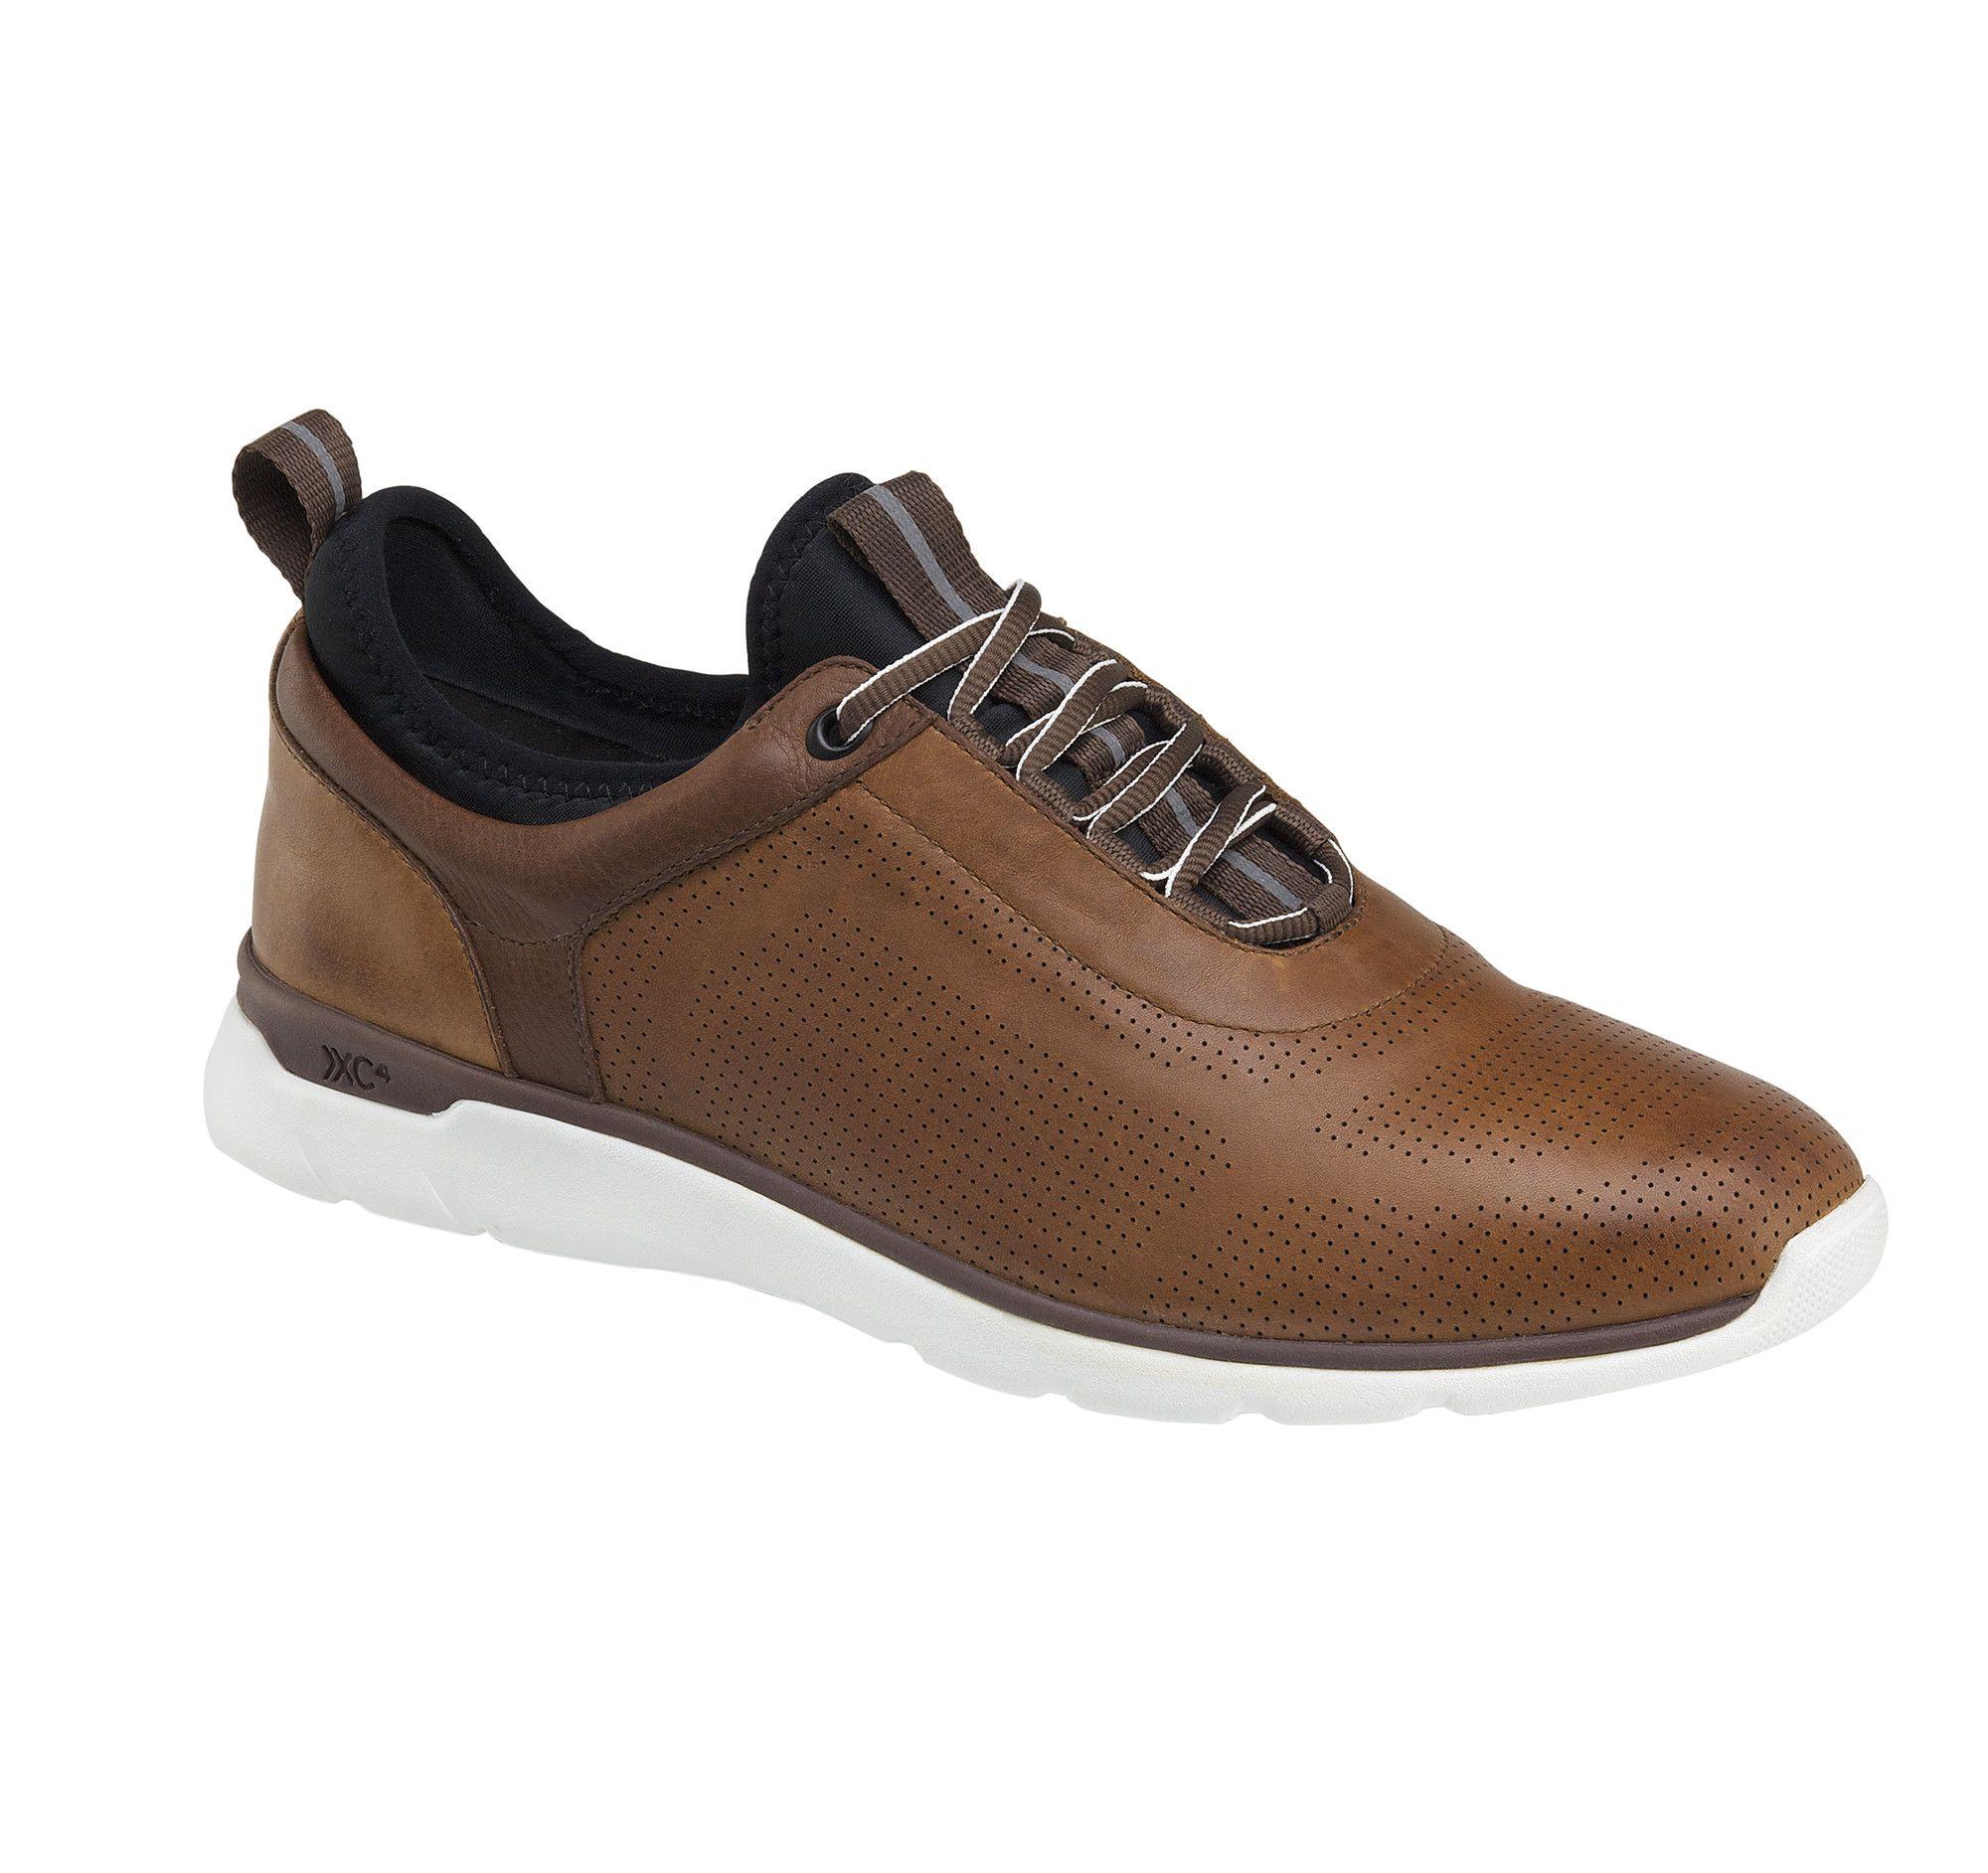 XC4® Prentiss U Throat   Johnston & Murphy   groovy shoes